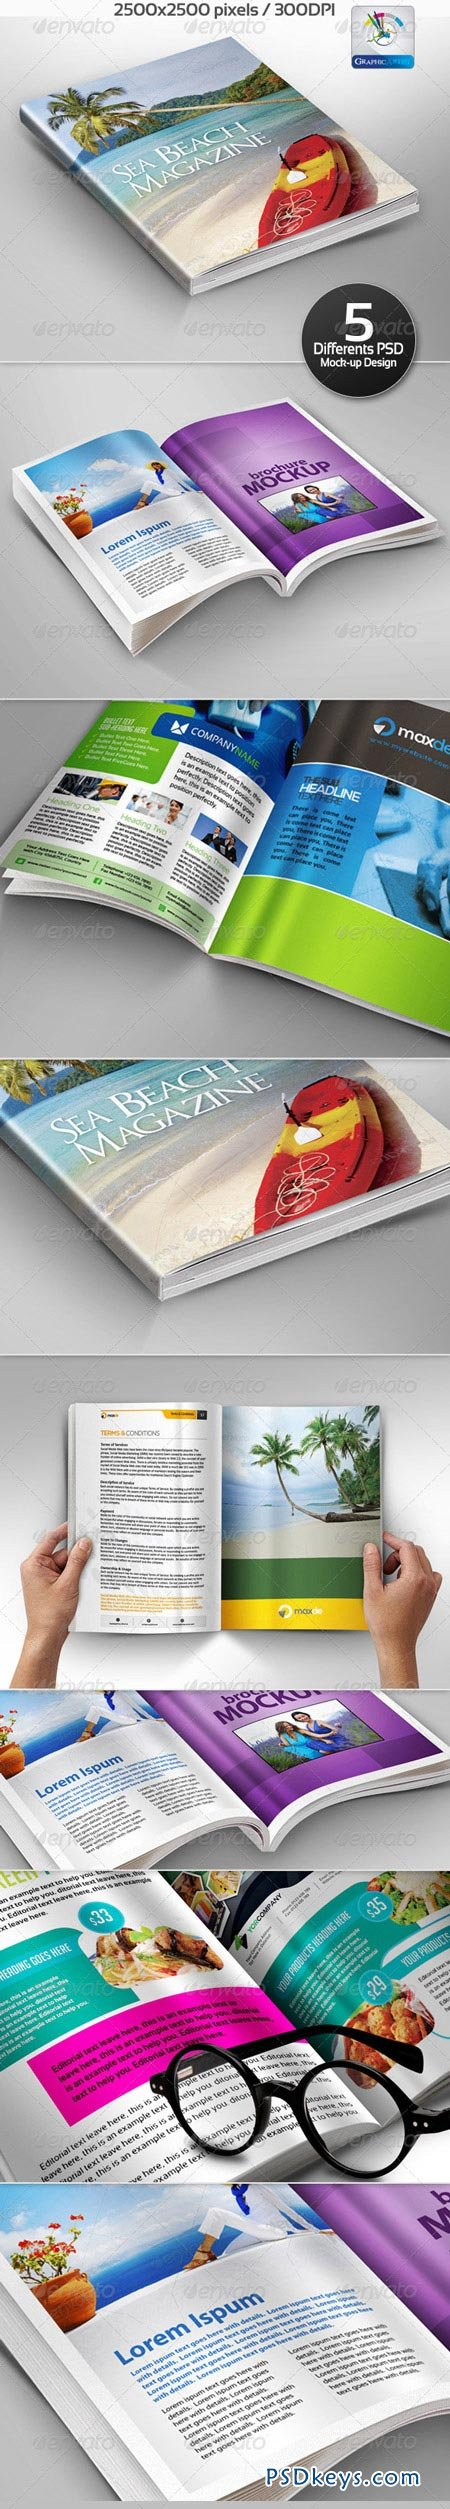 Realistic BookletMagazine Mock-ups 3214770